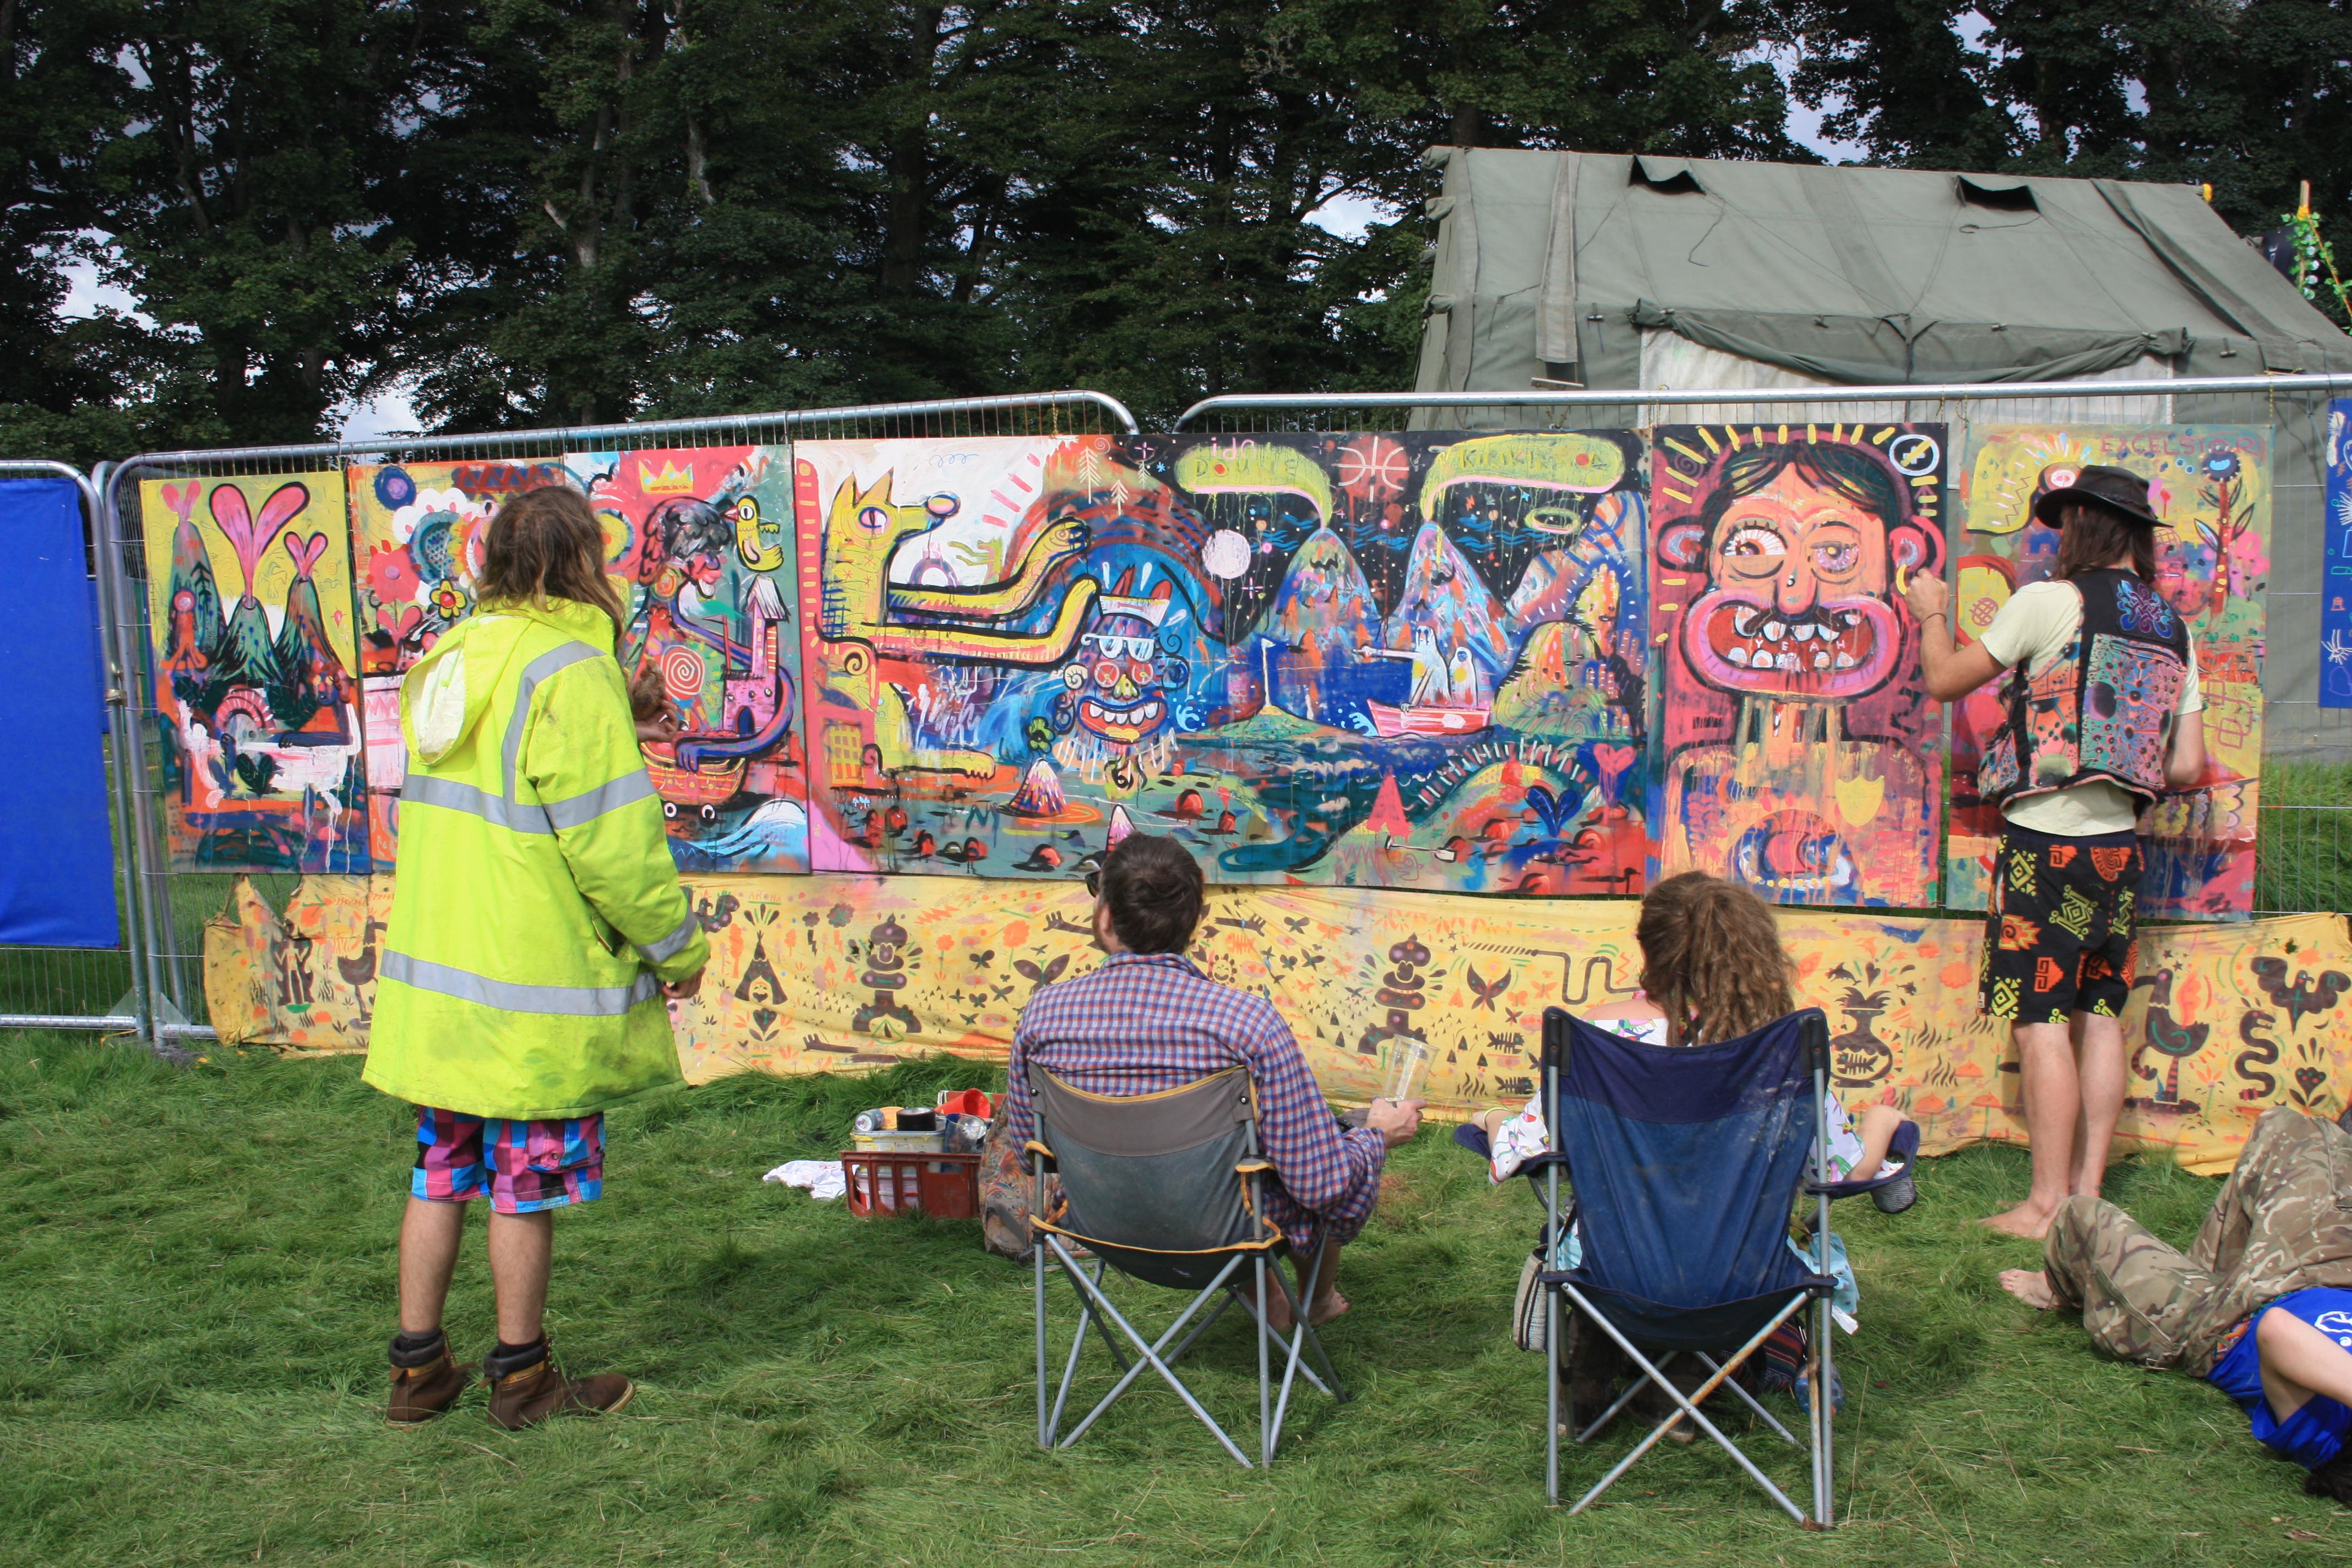 Doune The Rabbit Hole's Graffiti Wall